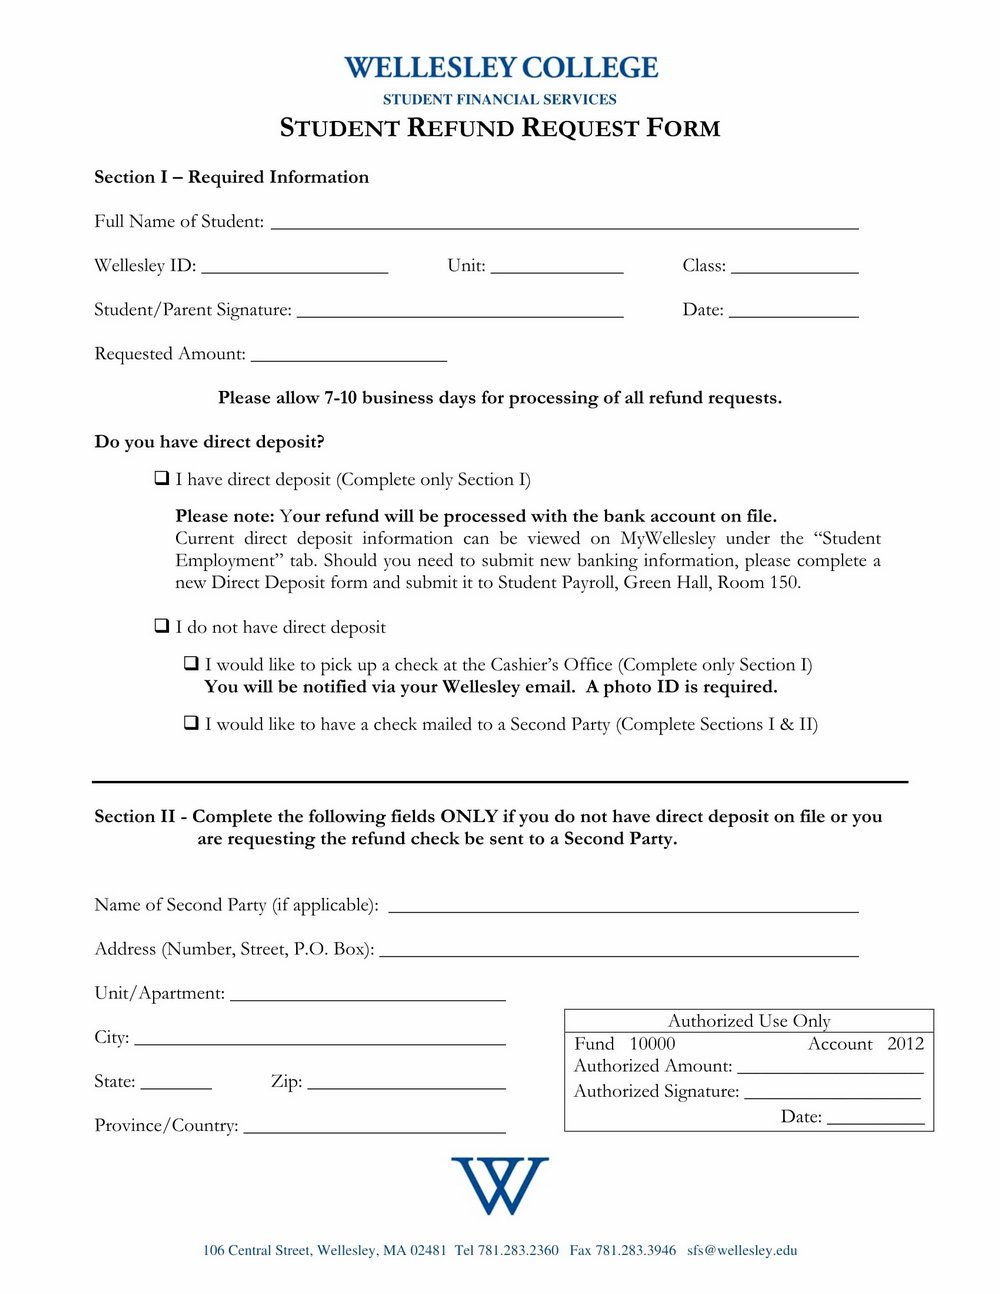 Fmla forms California California Fmla forms forms 9890